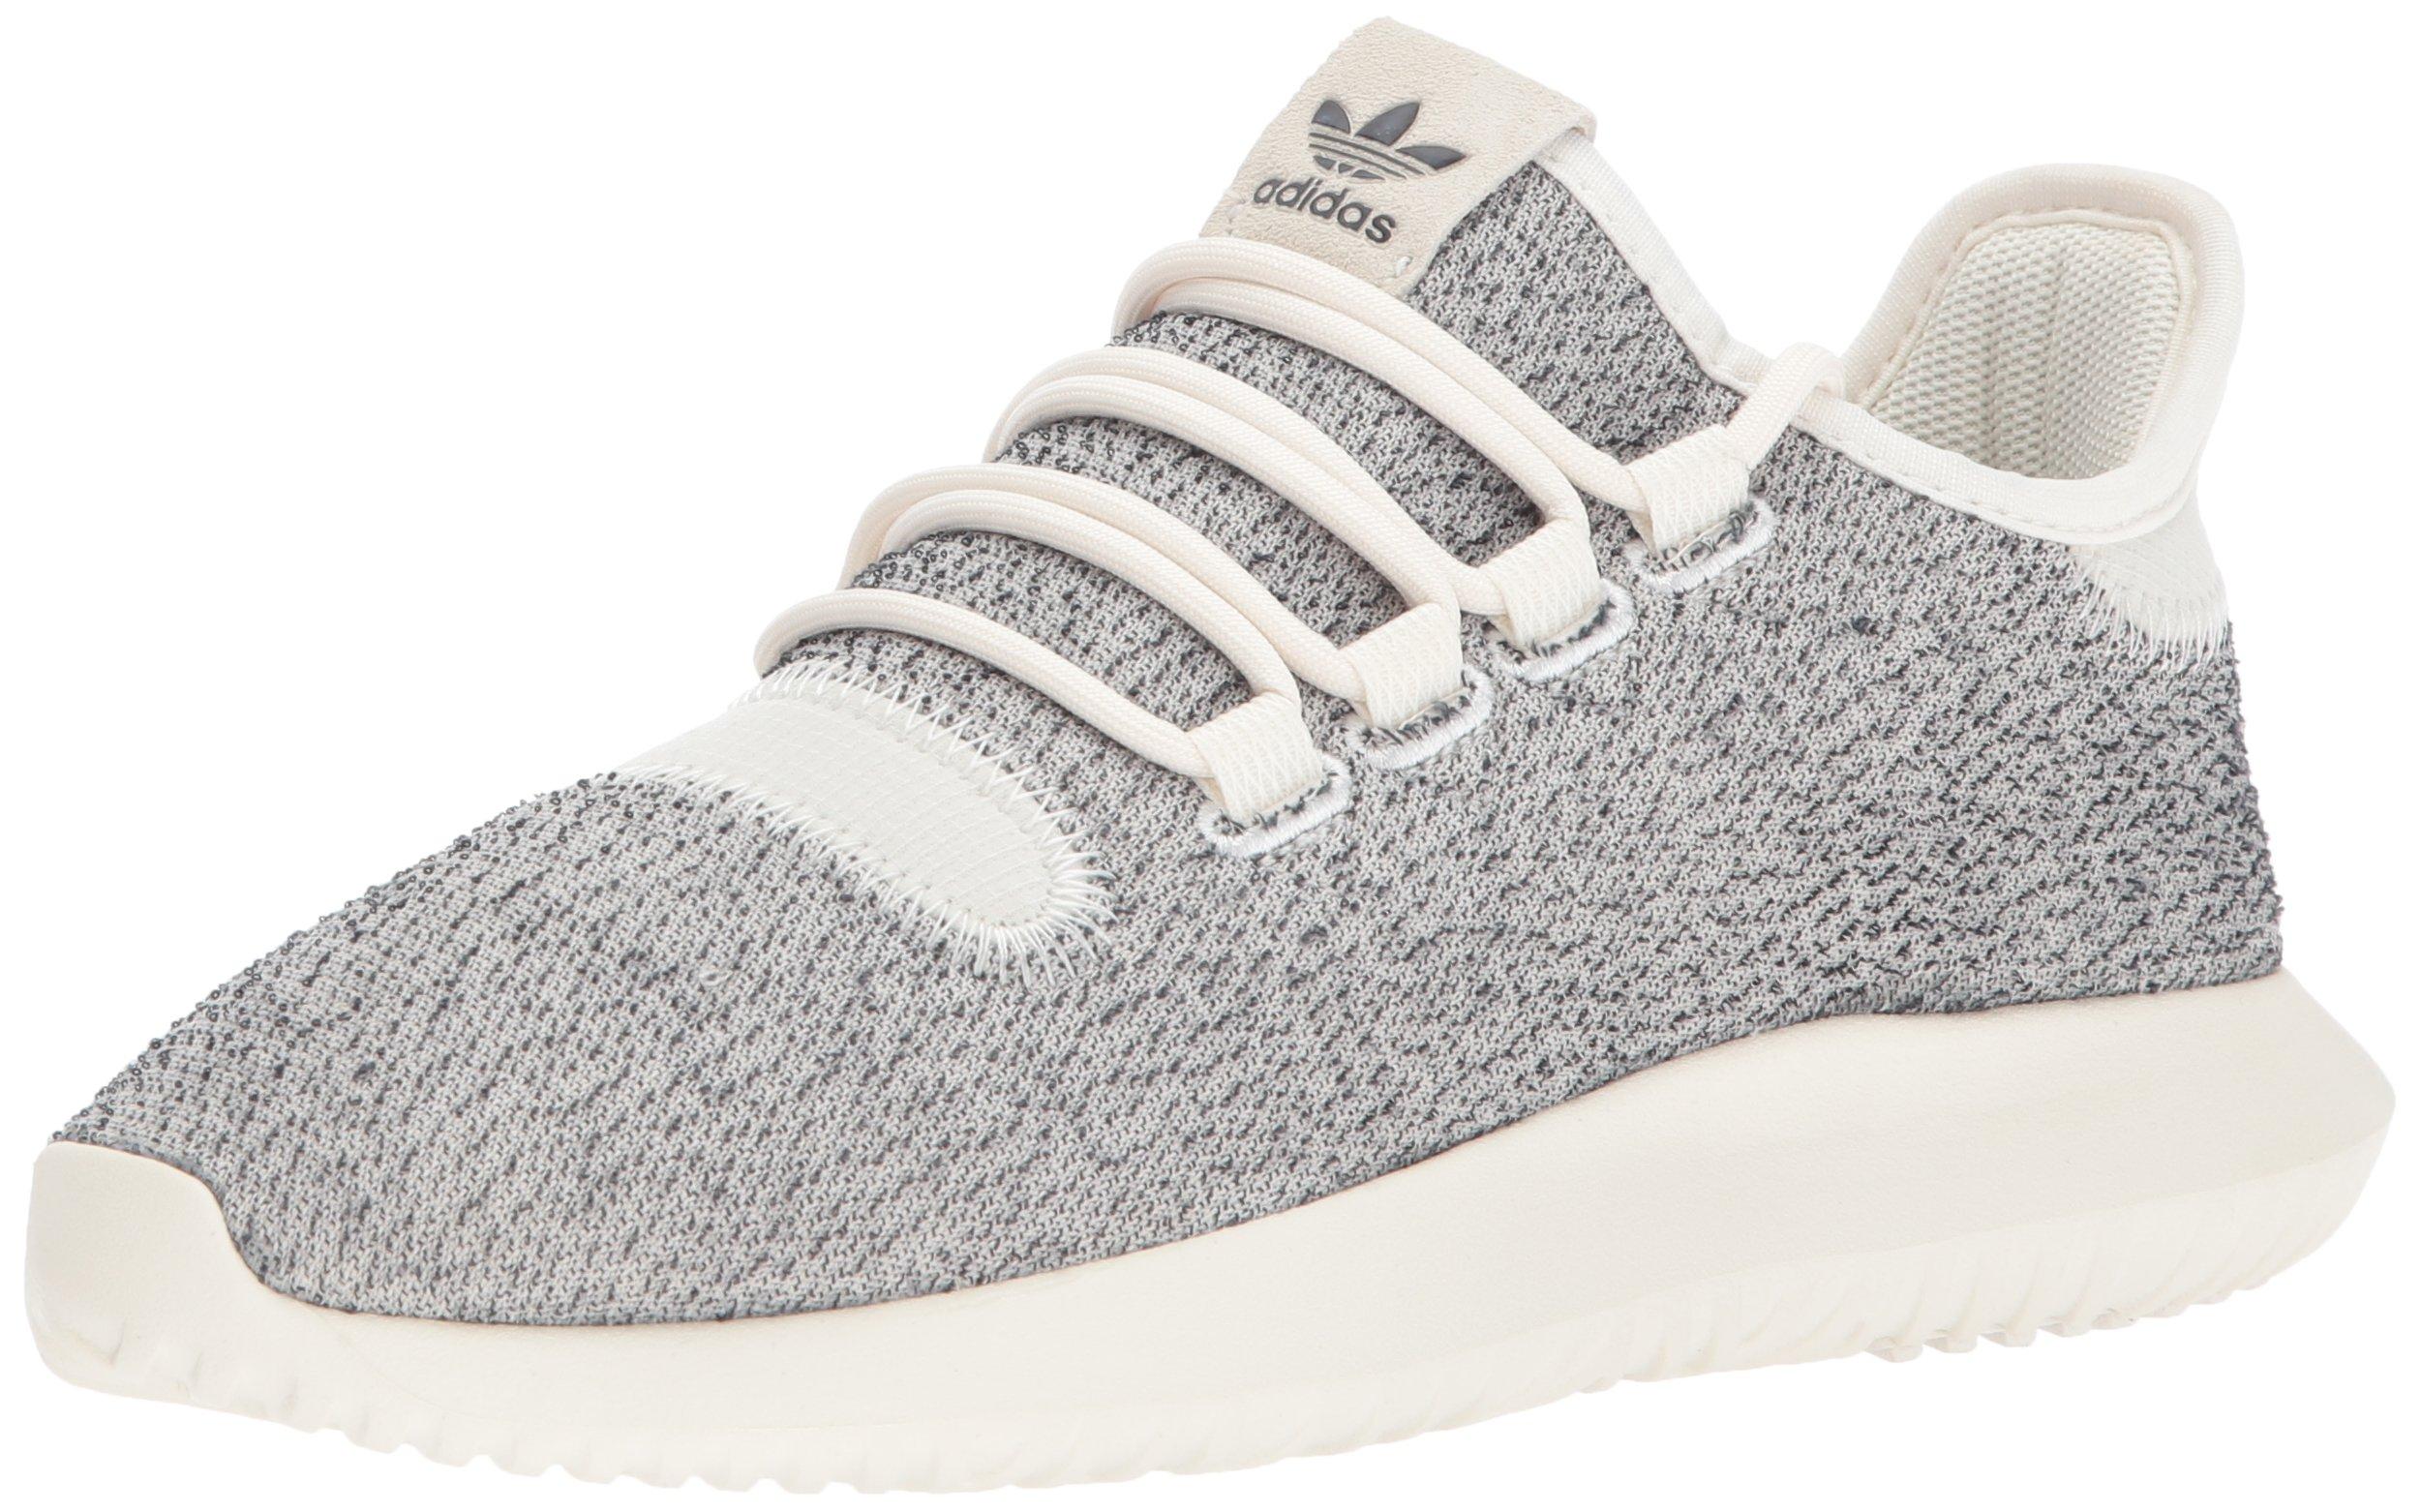 premium selection 04b11 189c5 Galleon - Adidas Originals Women s Tubular Shadow W Running Shoe White, 8.5  Medium US